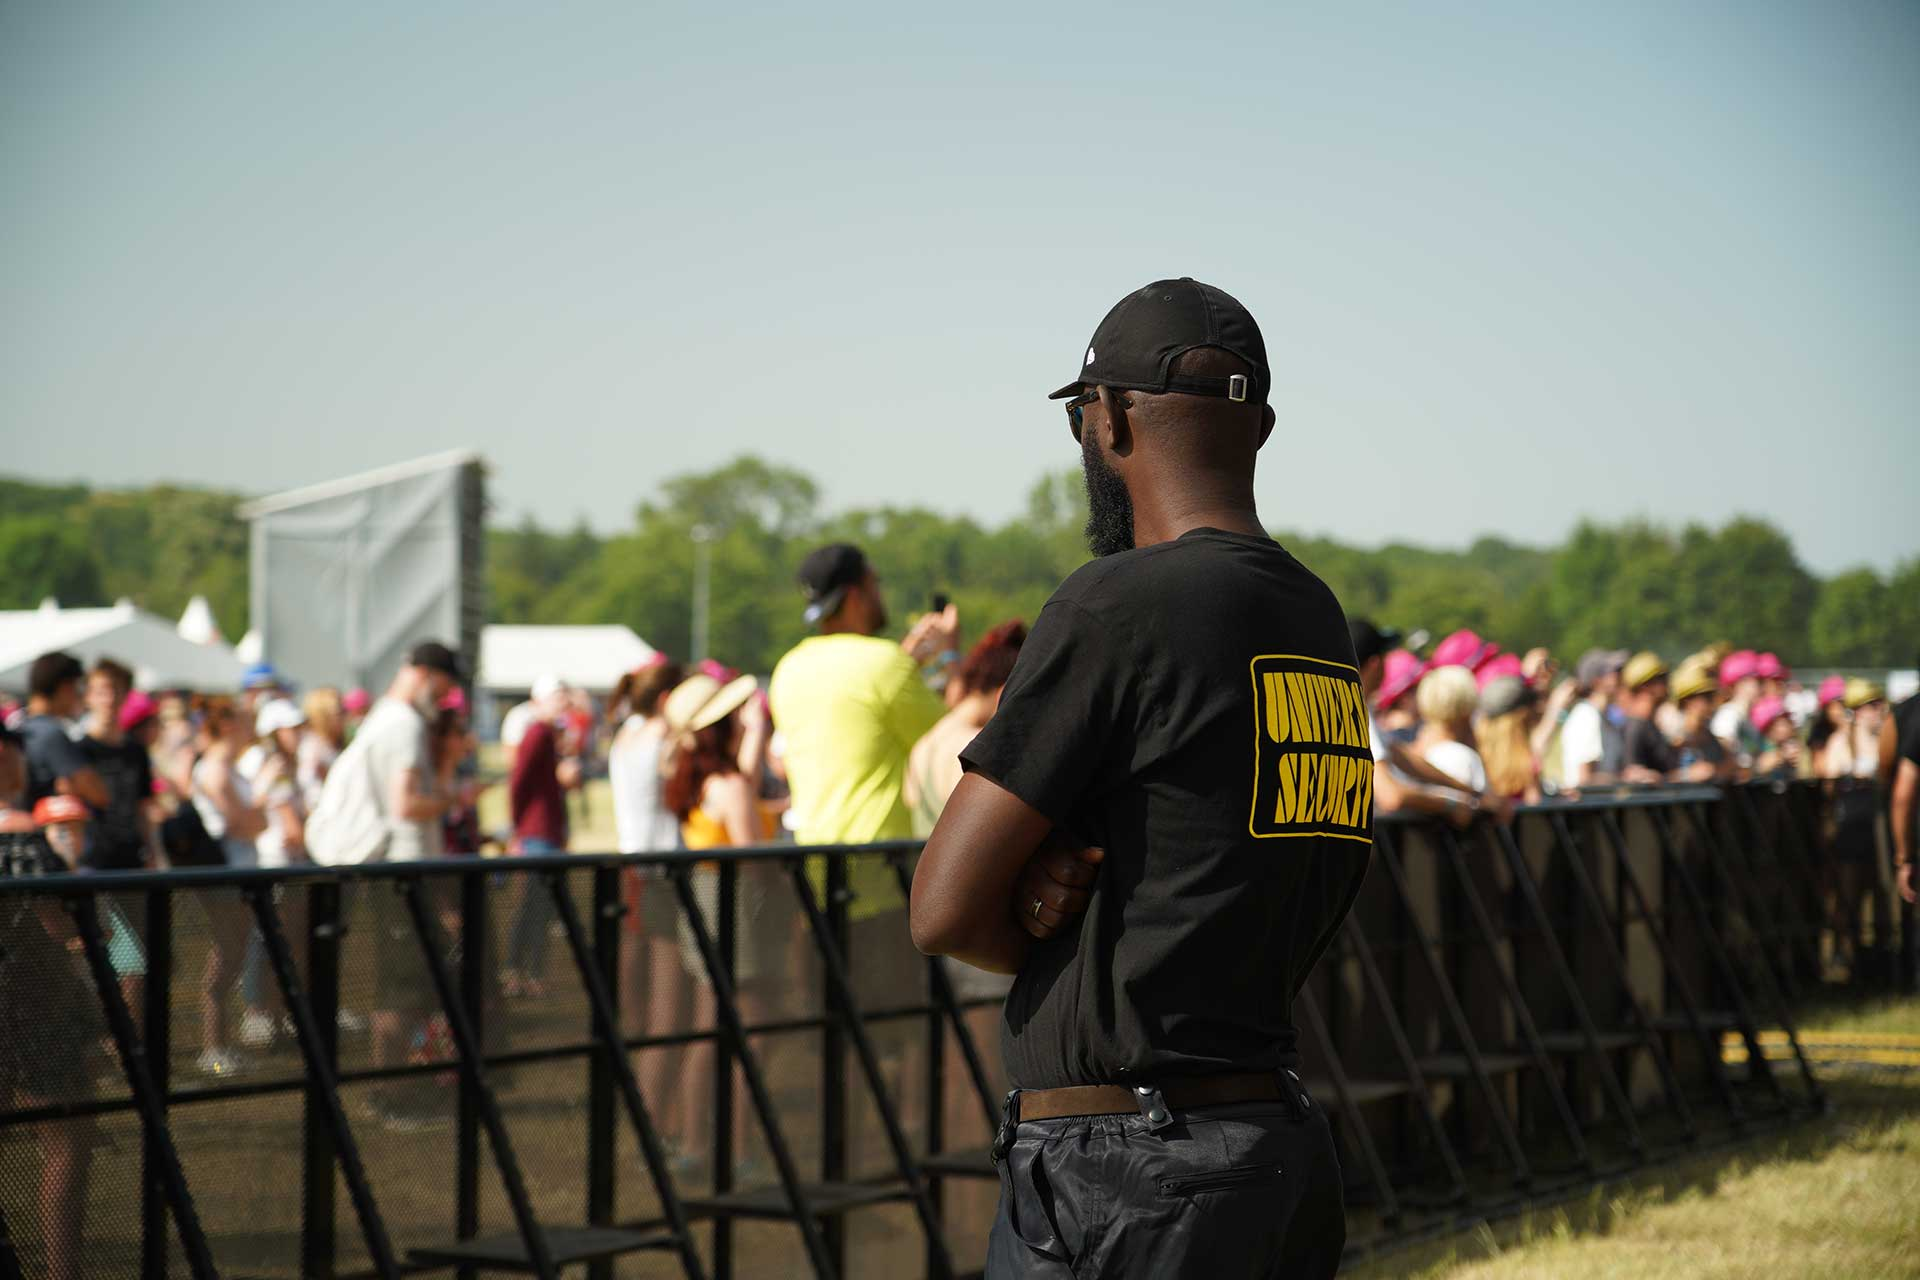 agent-ordre-festival-concert-normandie